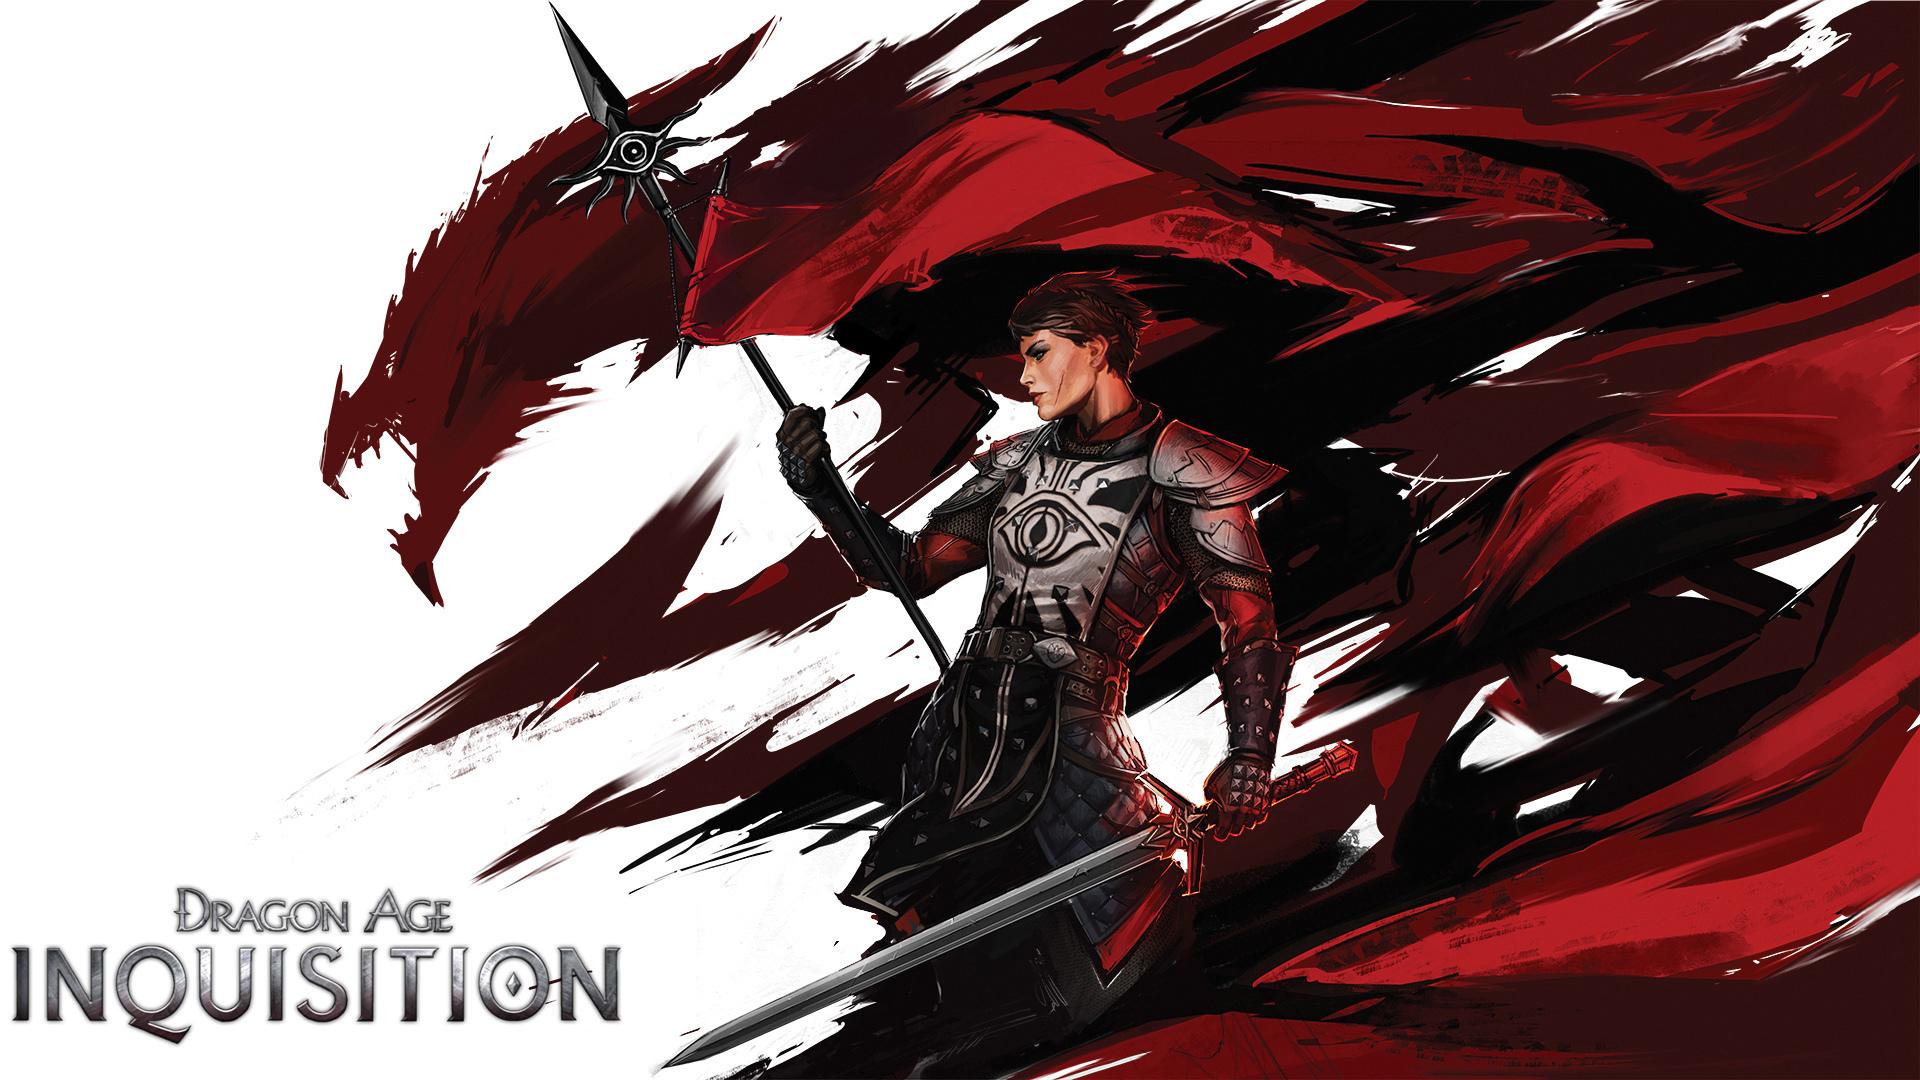 1920x1080 Cassandra Pentaghast Dragon Age Inquisition 1080p